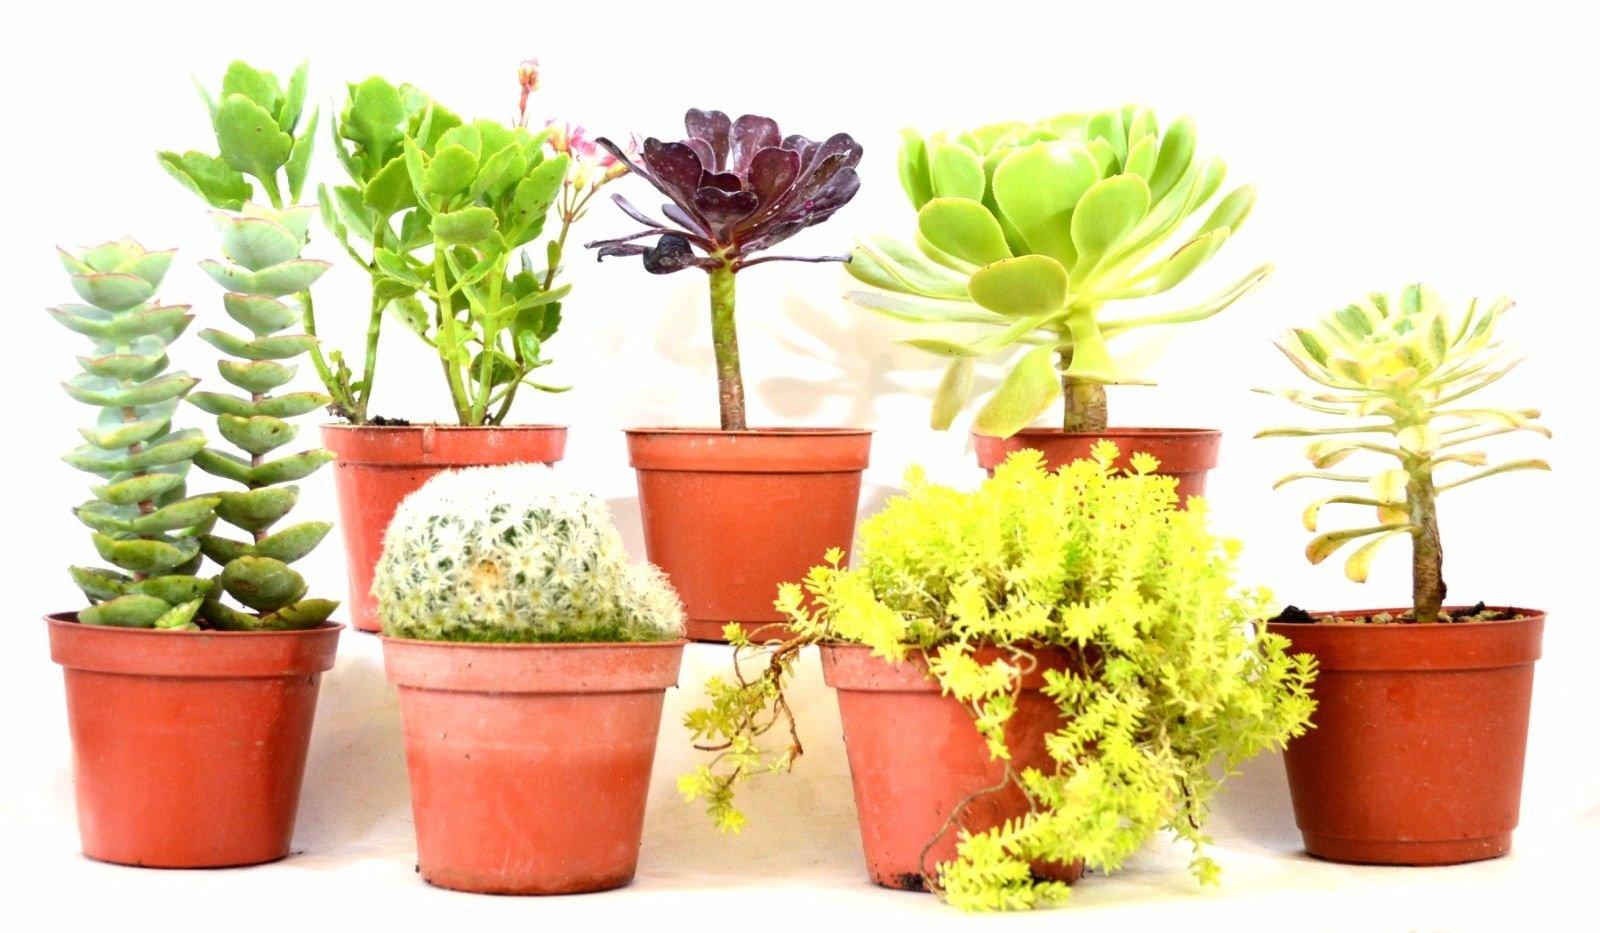 Live 7 Set Mixed Succulents Desert 2'' Pot Garden Plant